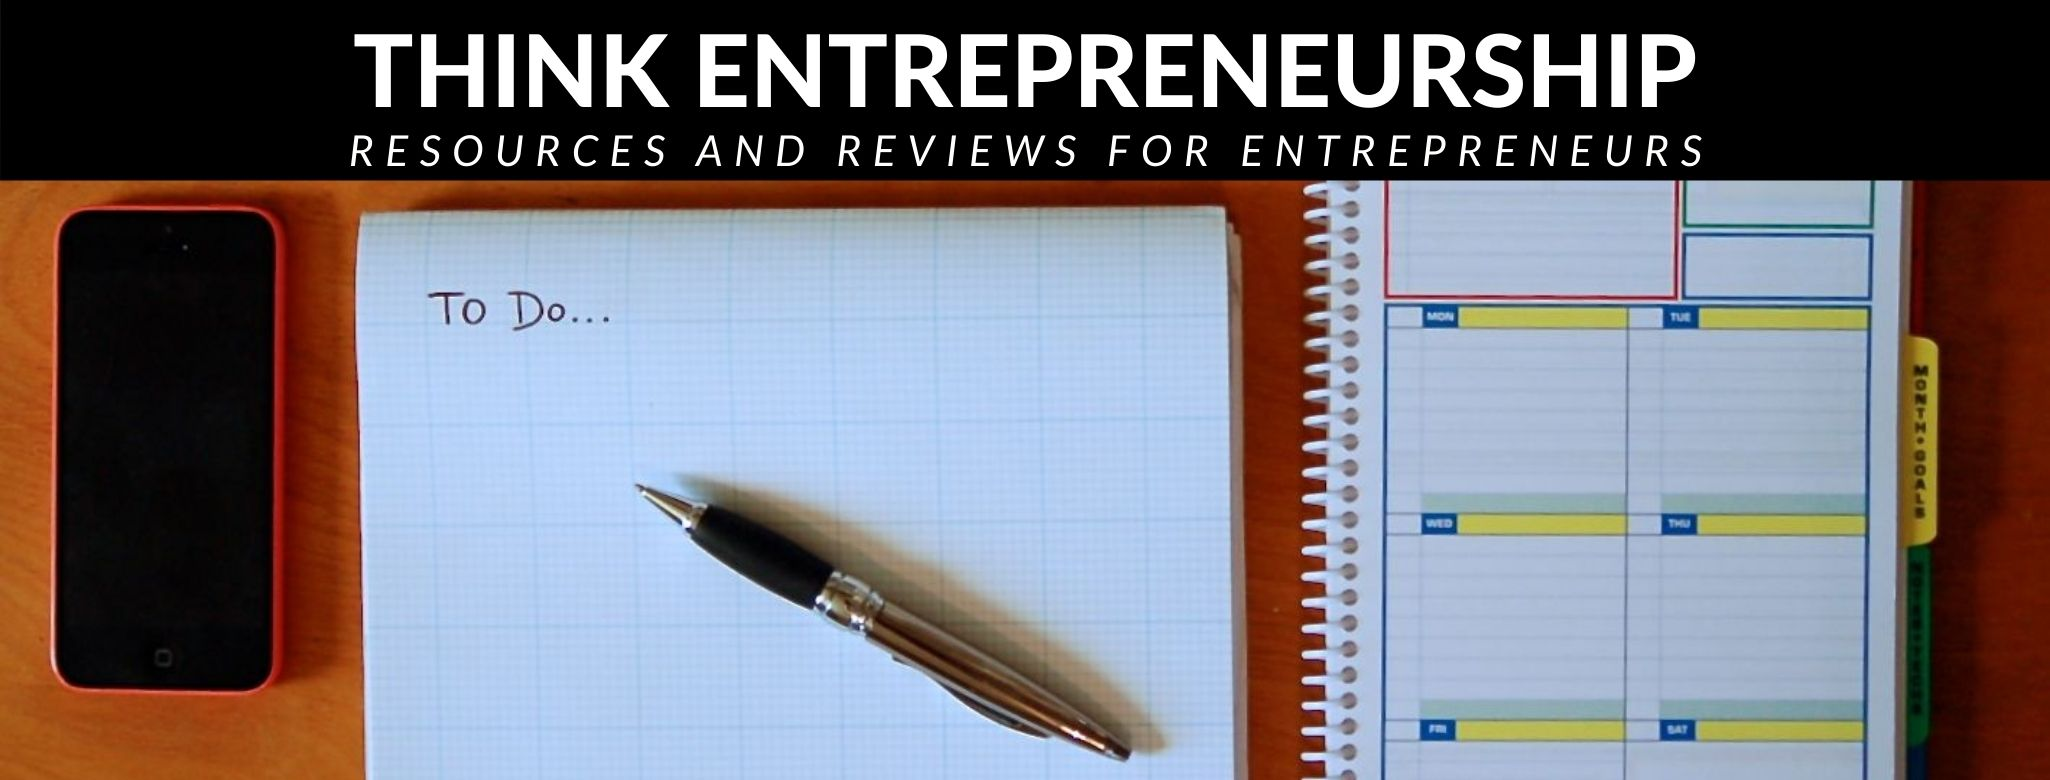 Think Entrepreneurship Organization Header